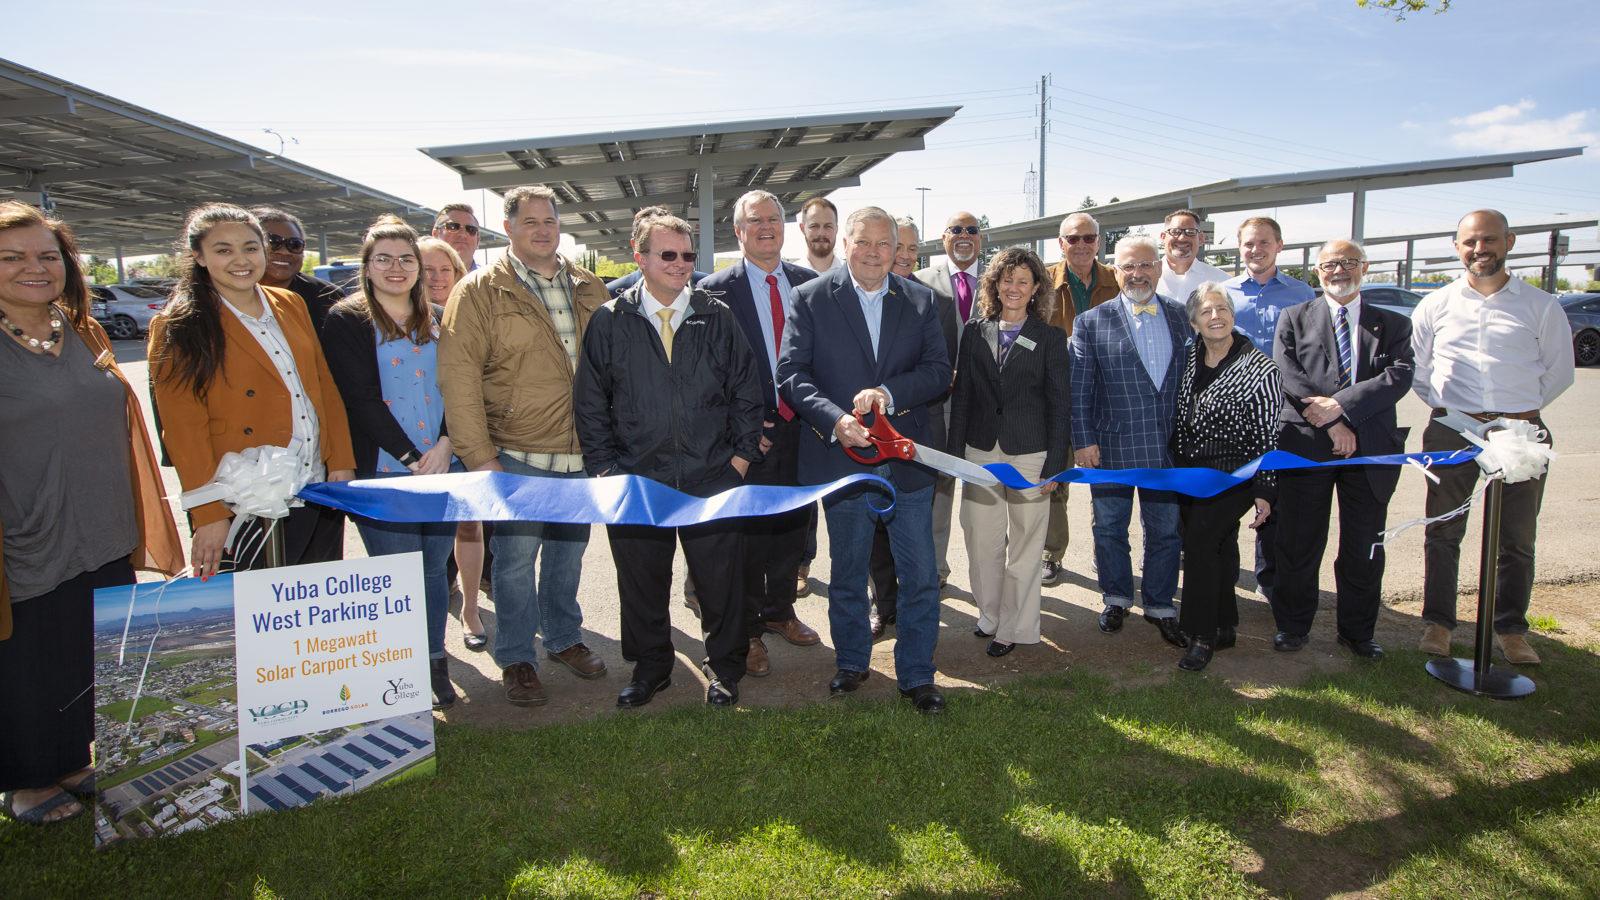 Yuba College and Borrego Solar Systems Celebrate Operation of 1 Megawatt Solar Carport Project